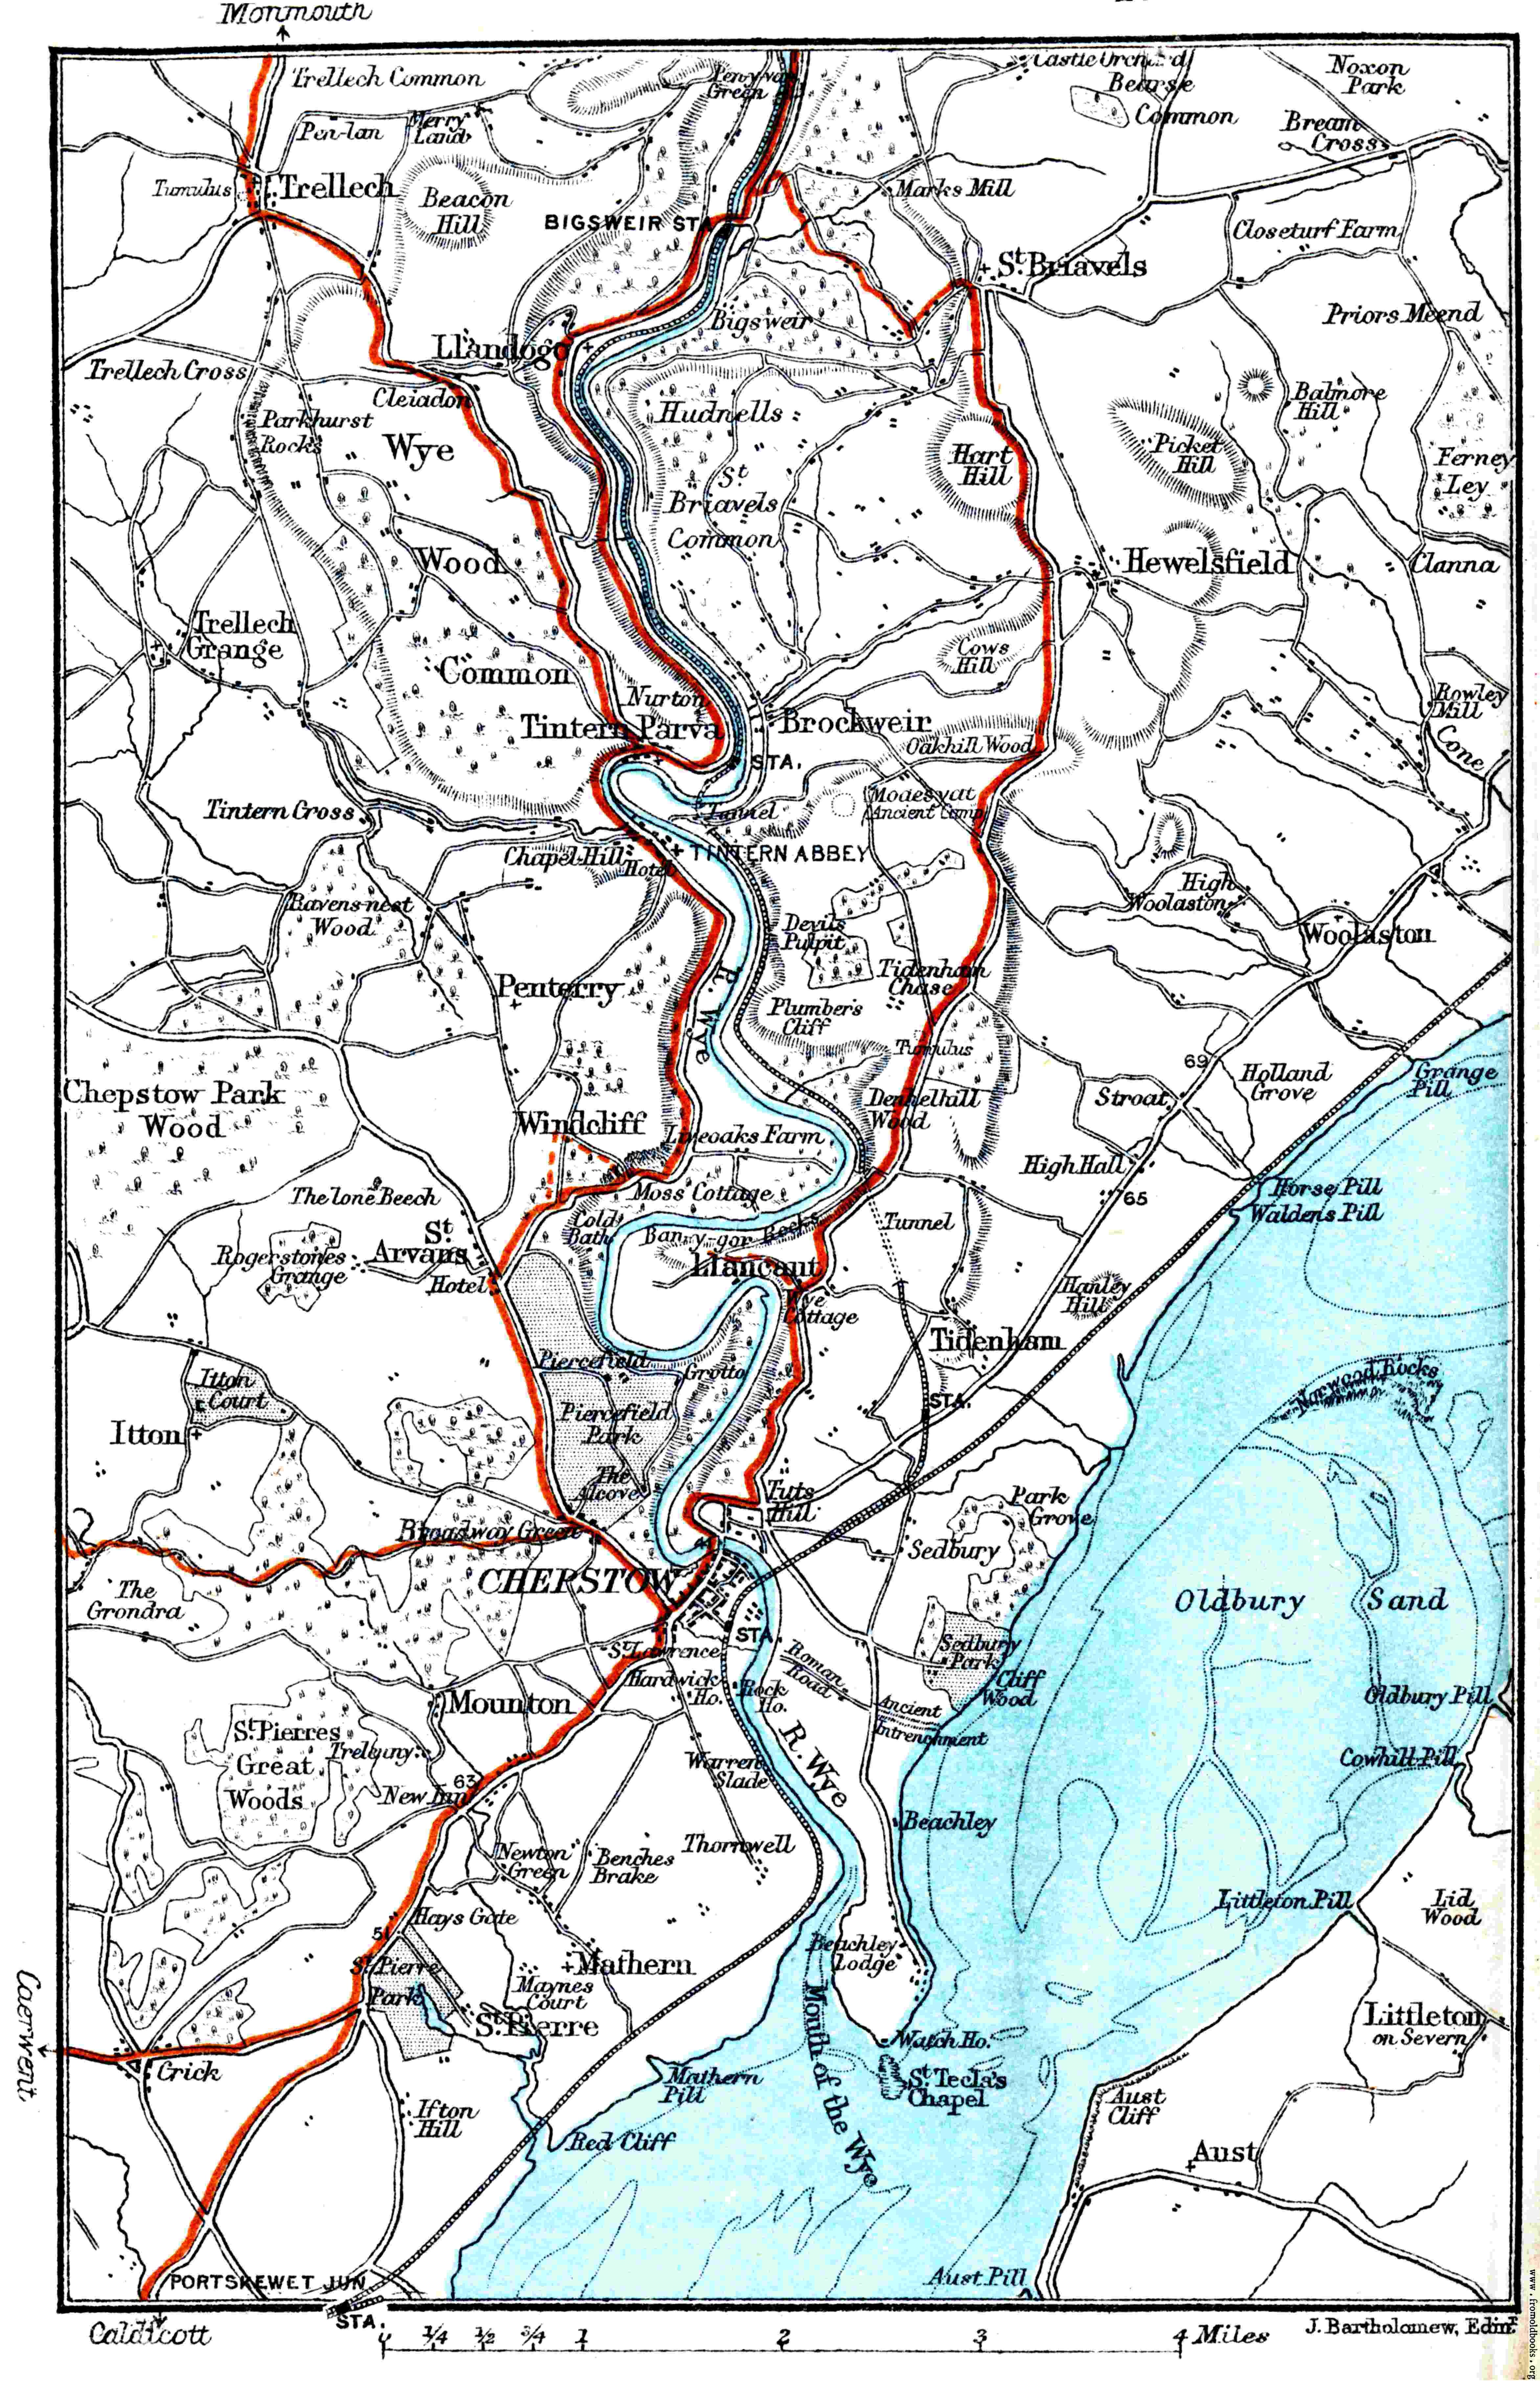 Map river wye chepstow etc 4689x7259 957k jpg free download gumiabroncs Choice Image